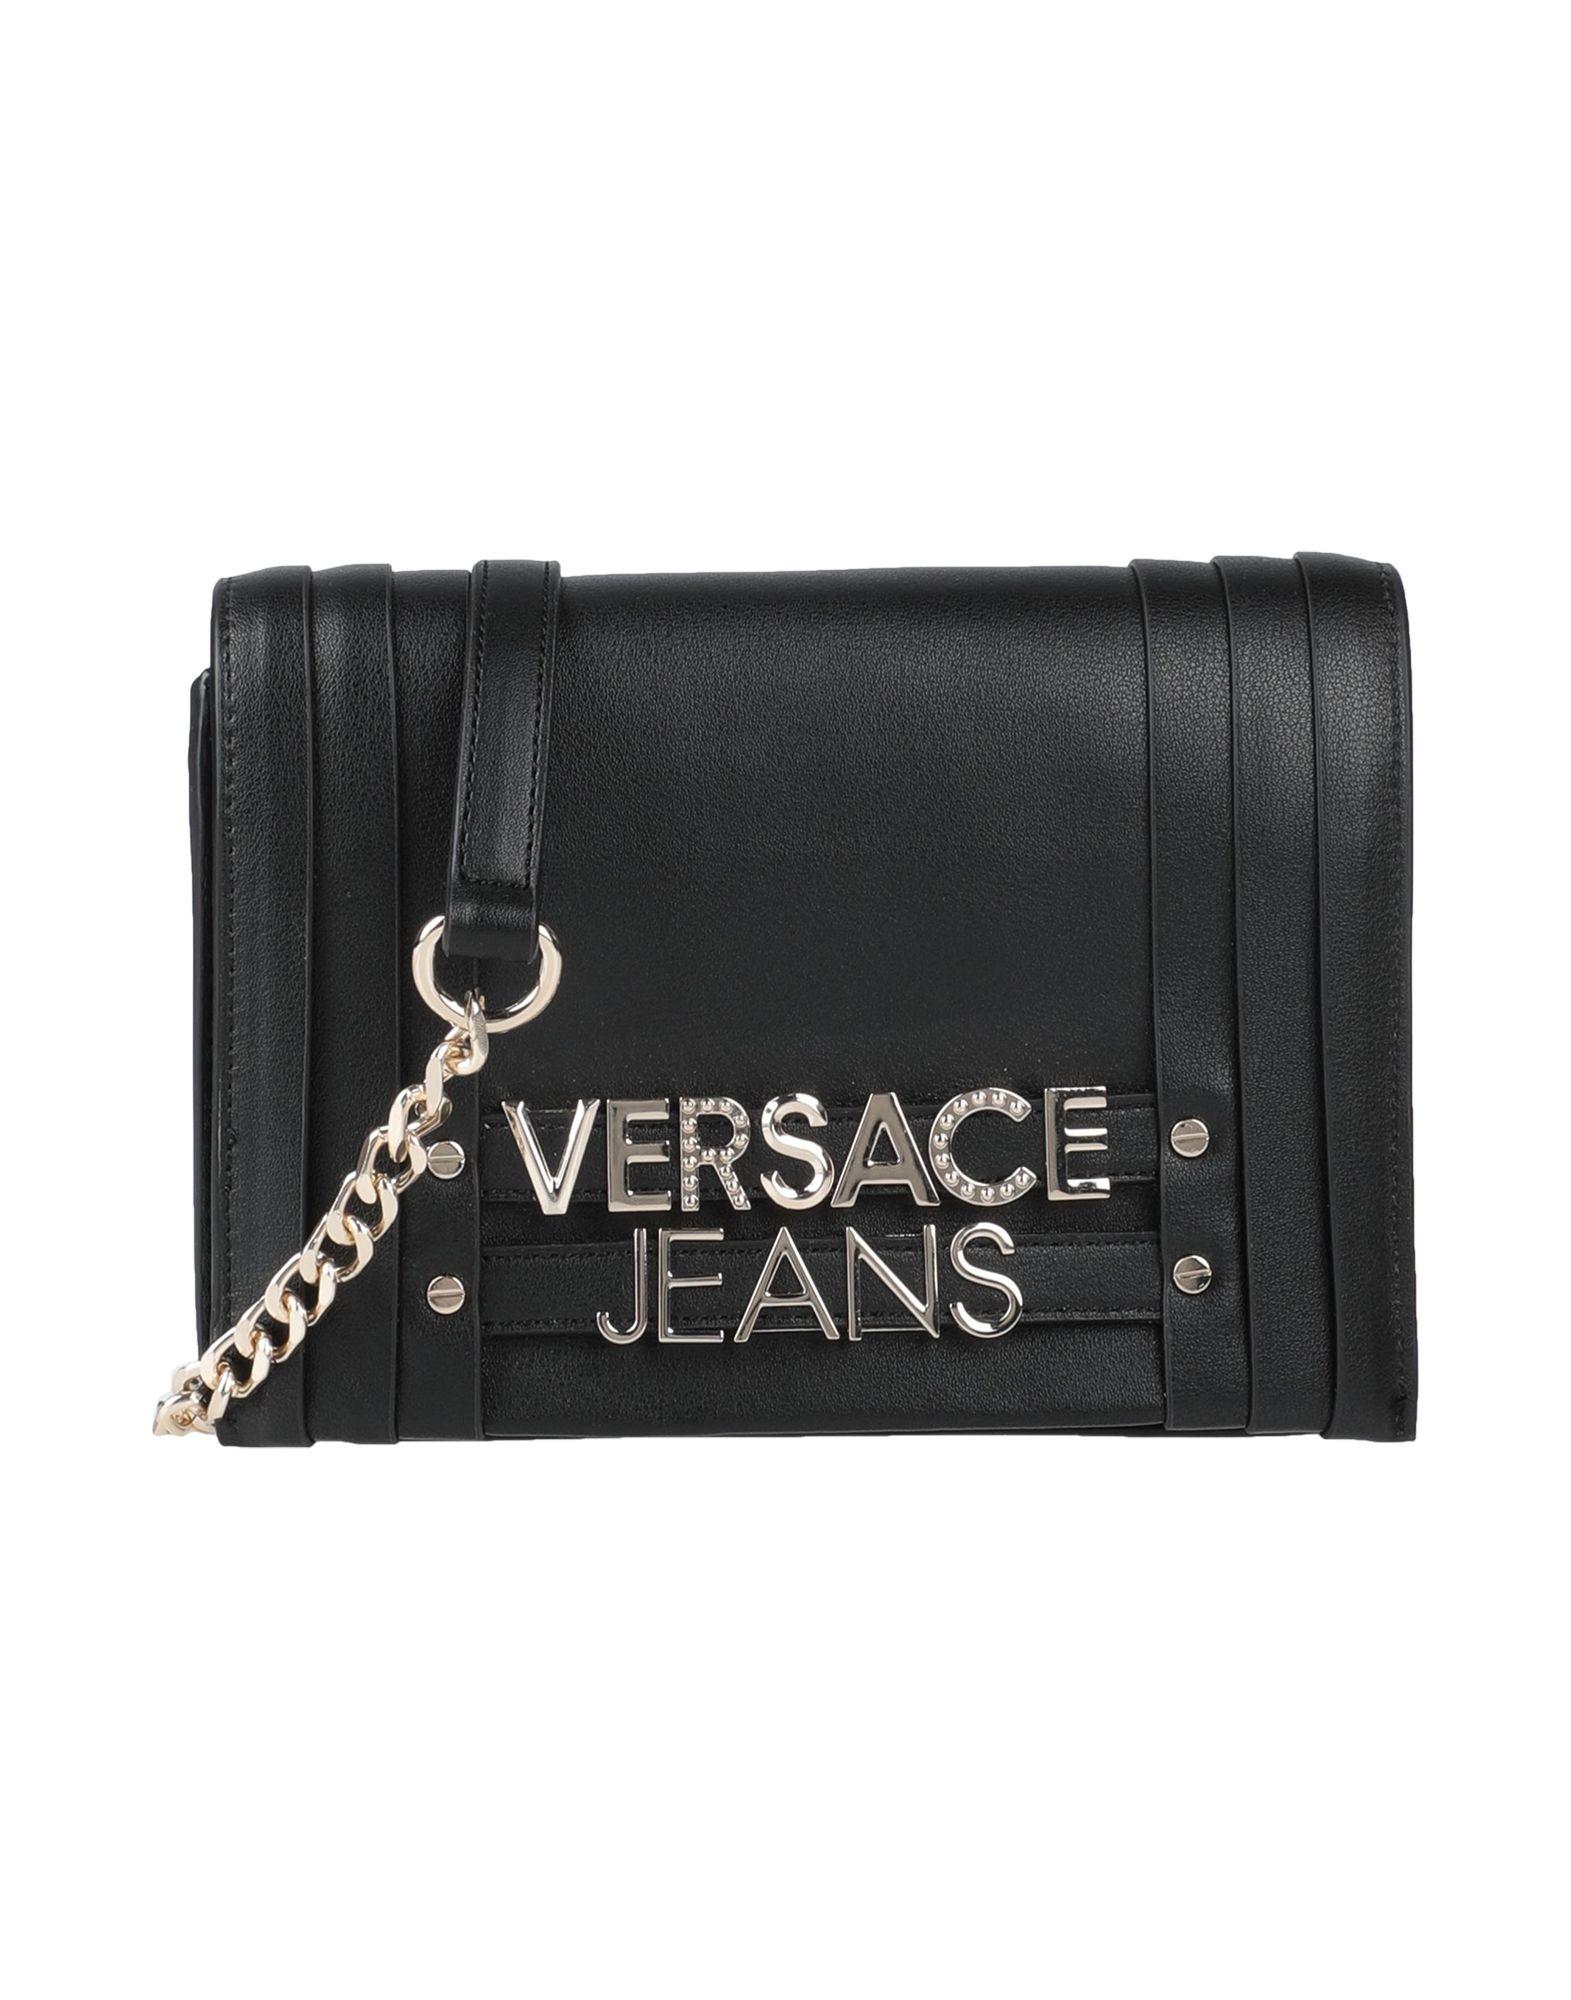 VERSACE JEANS Сумка через плечо сумка versace jeans versace jeans ve006bwubh50